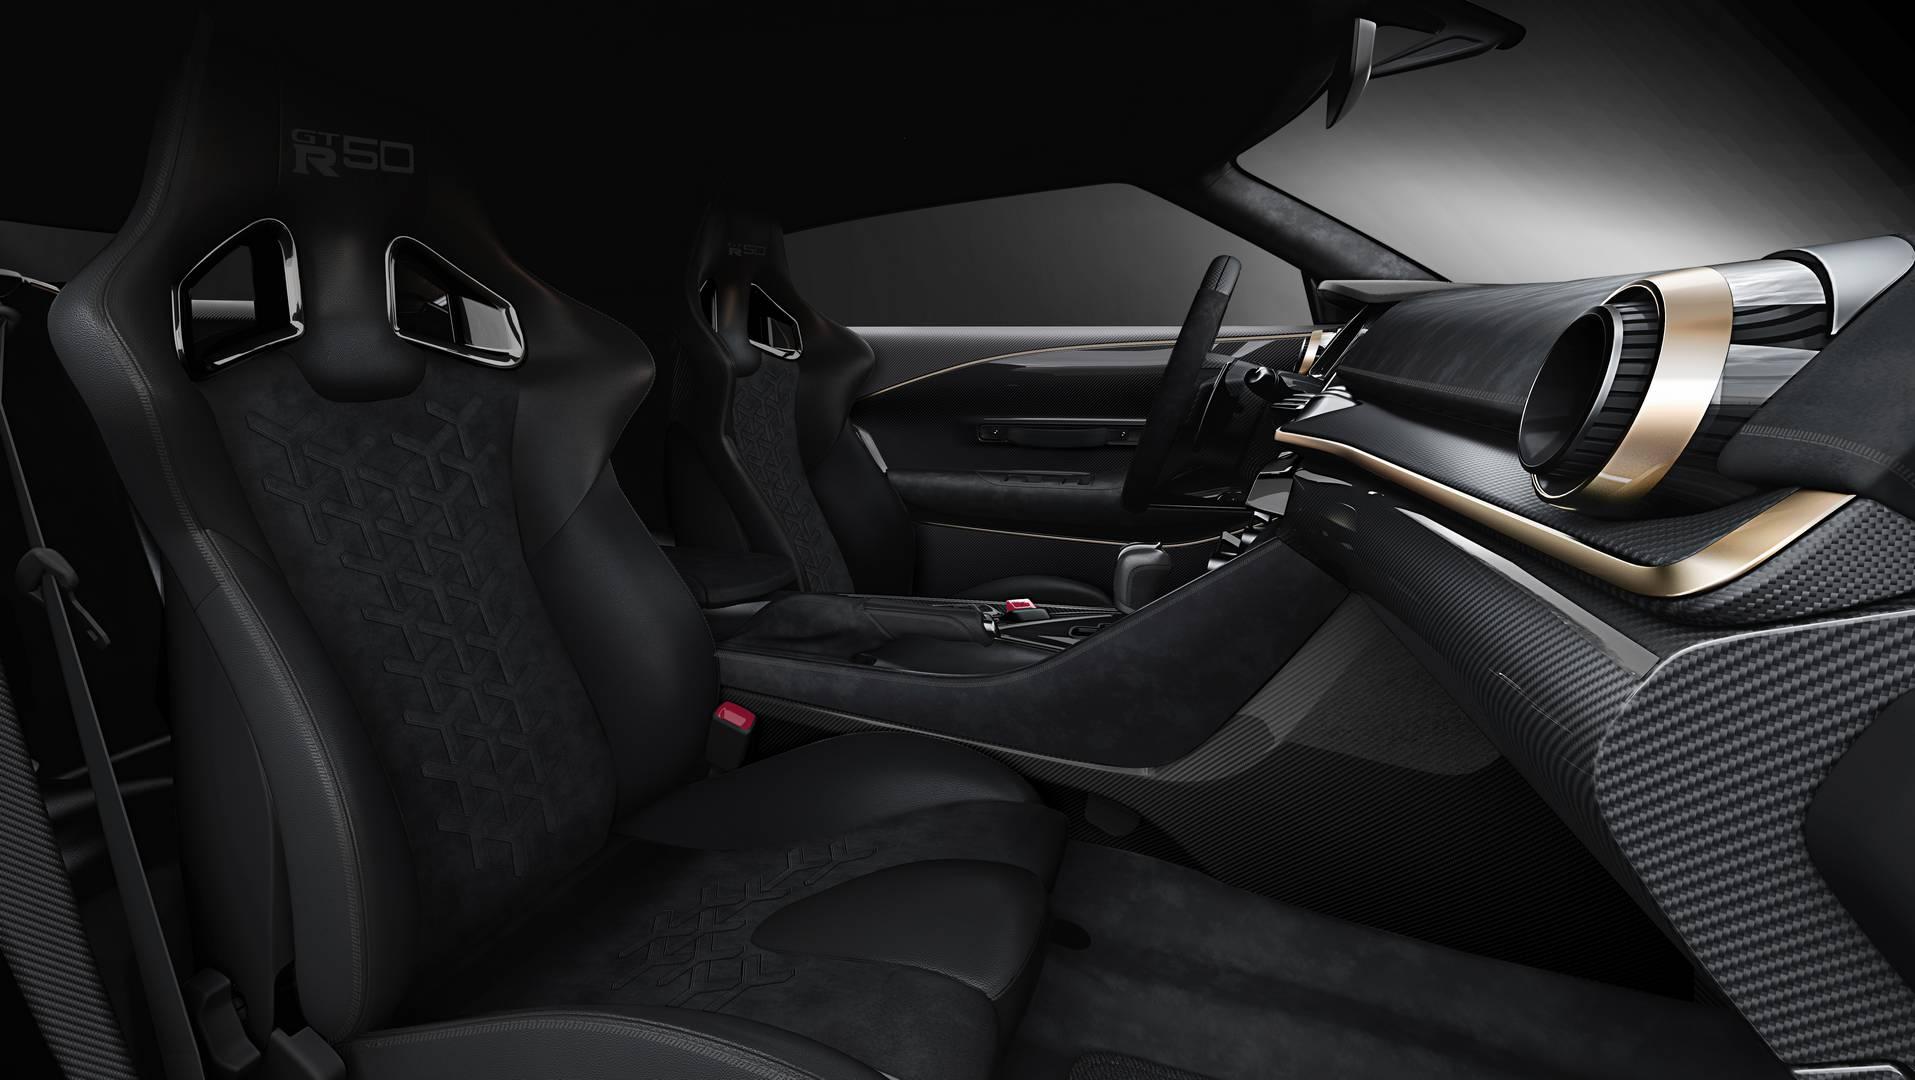 NISMO настроили 3,8-литровый двигатель V6 на 720 л.с. и 780 Нм крутящего момента.